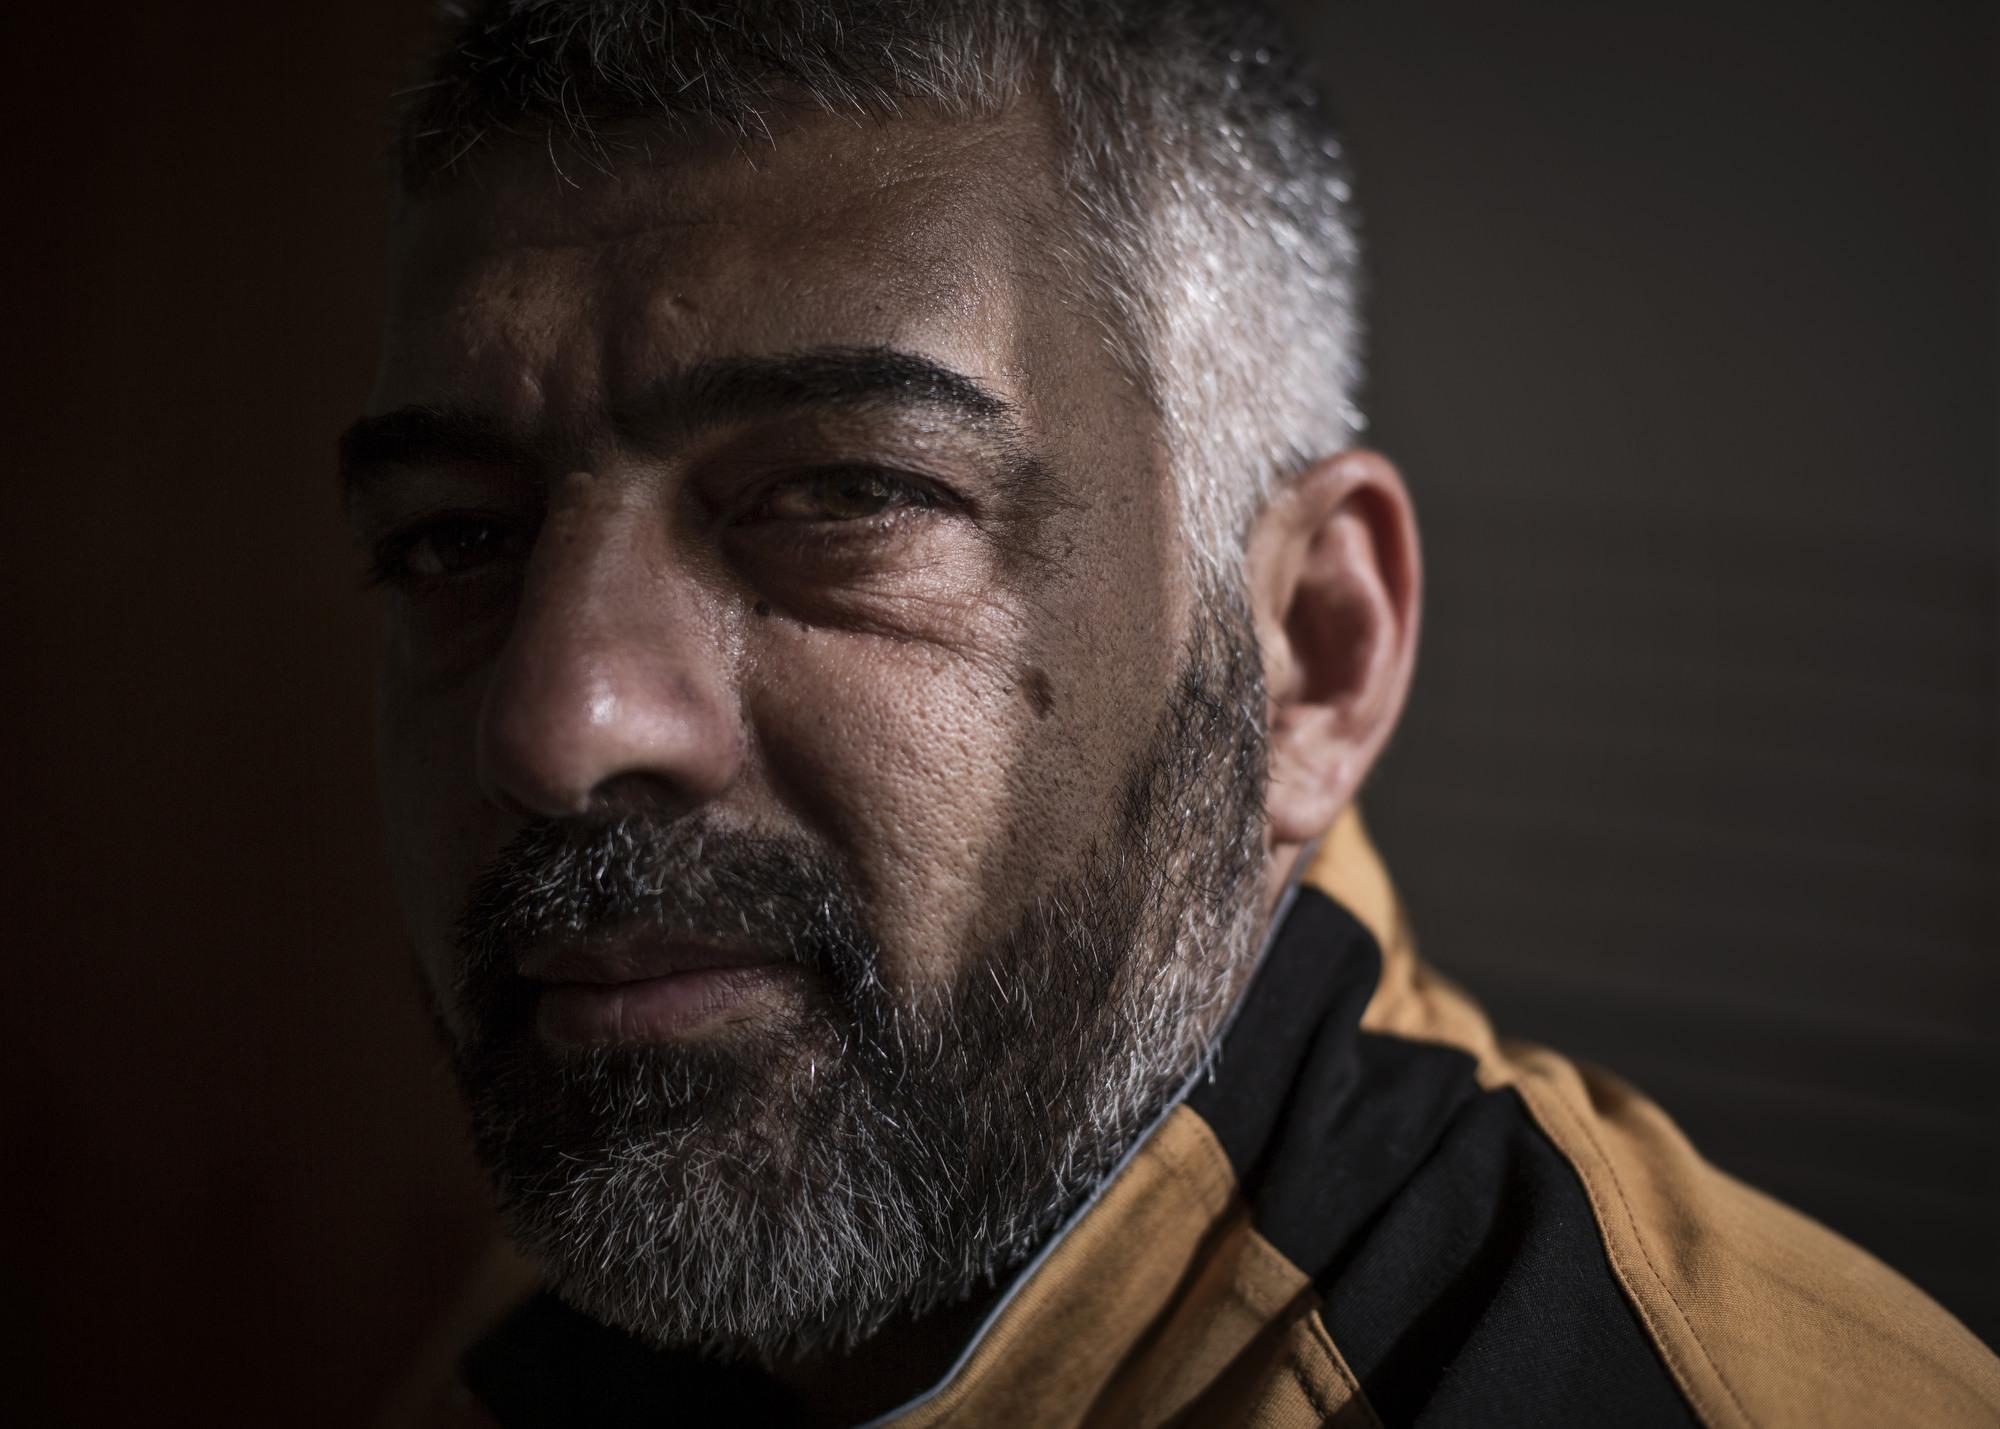 The leader of a Turkman militia.